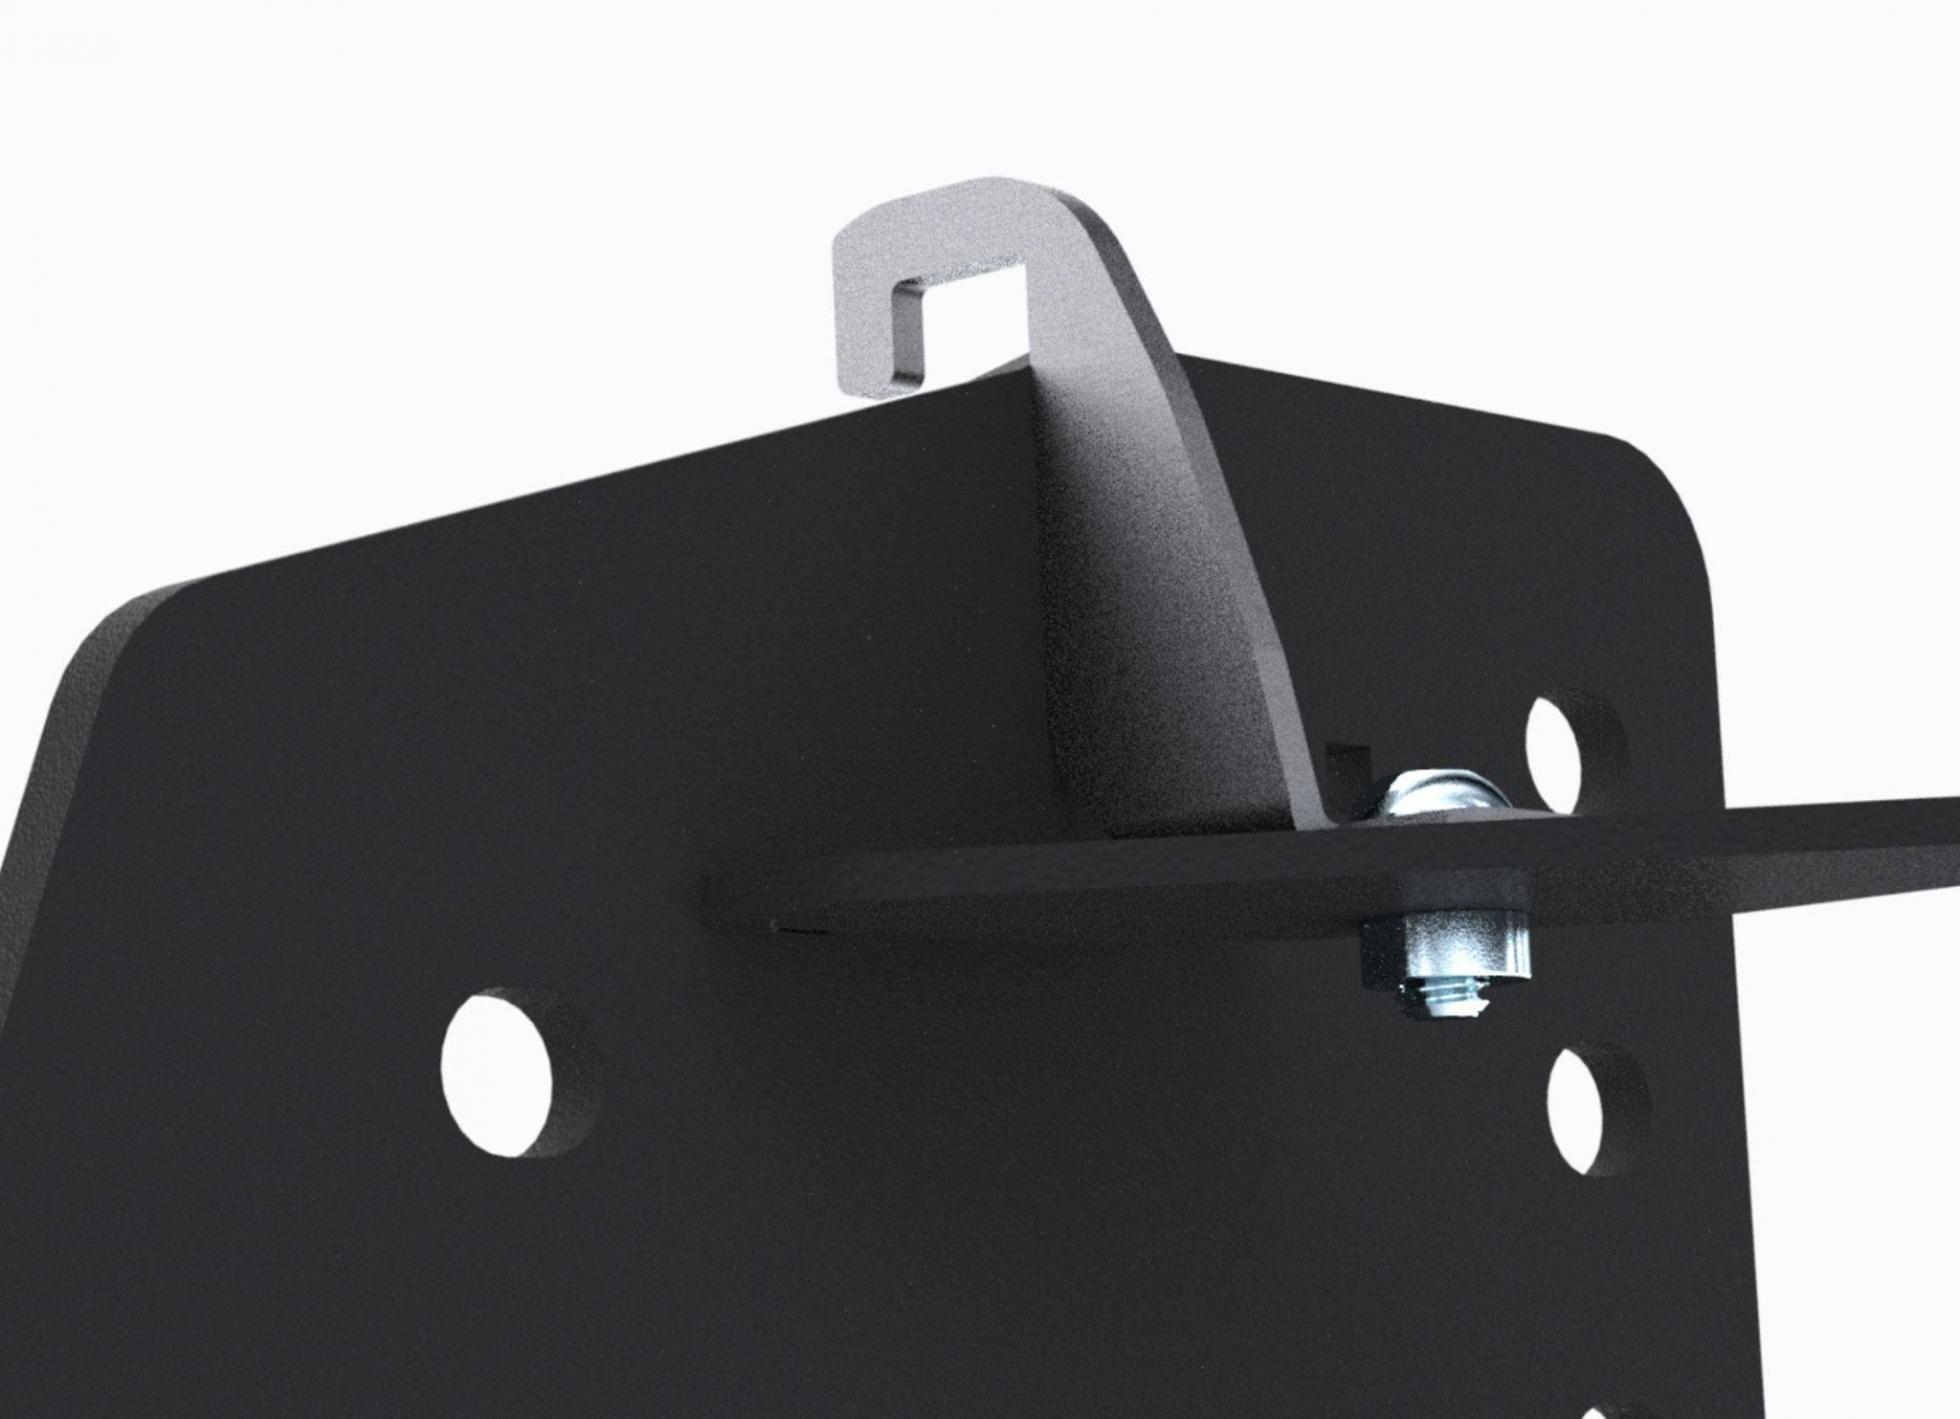 *REVIEW* Artec Industries Venture Bumper-tab-2-jpg